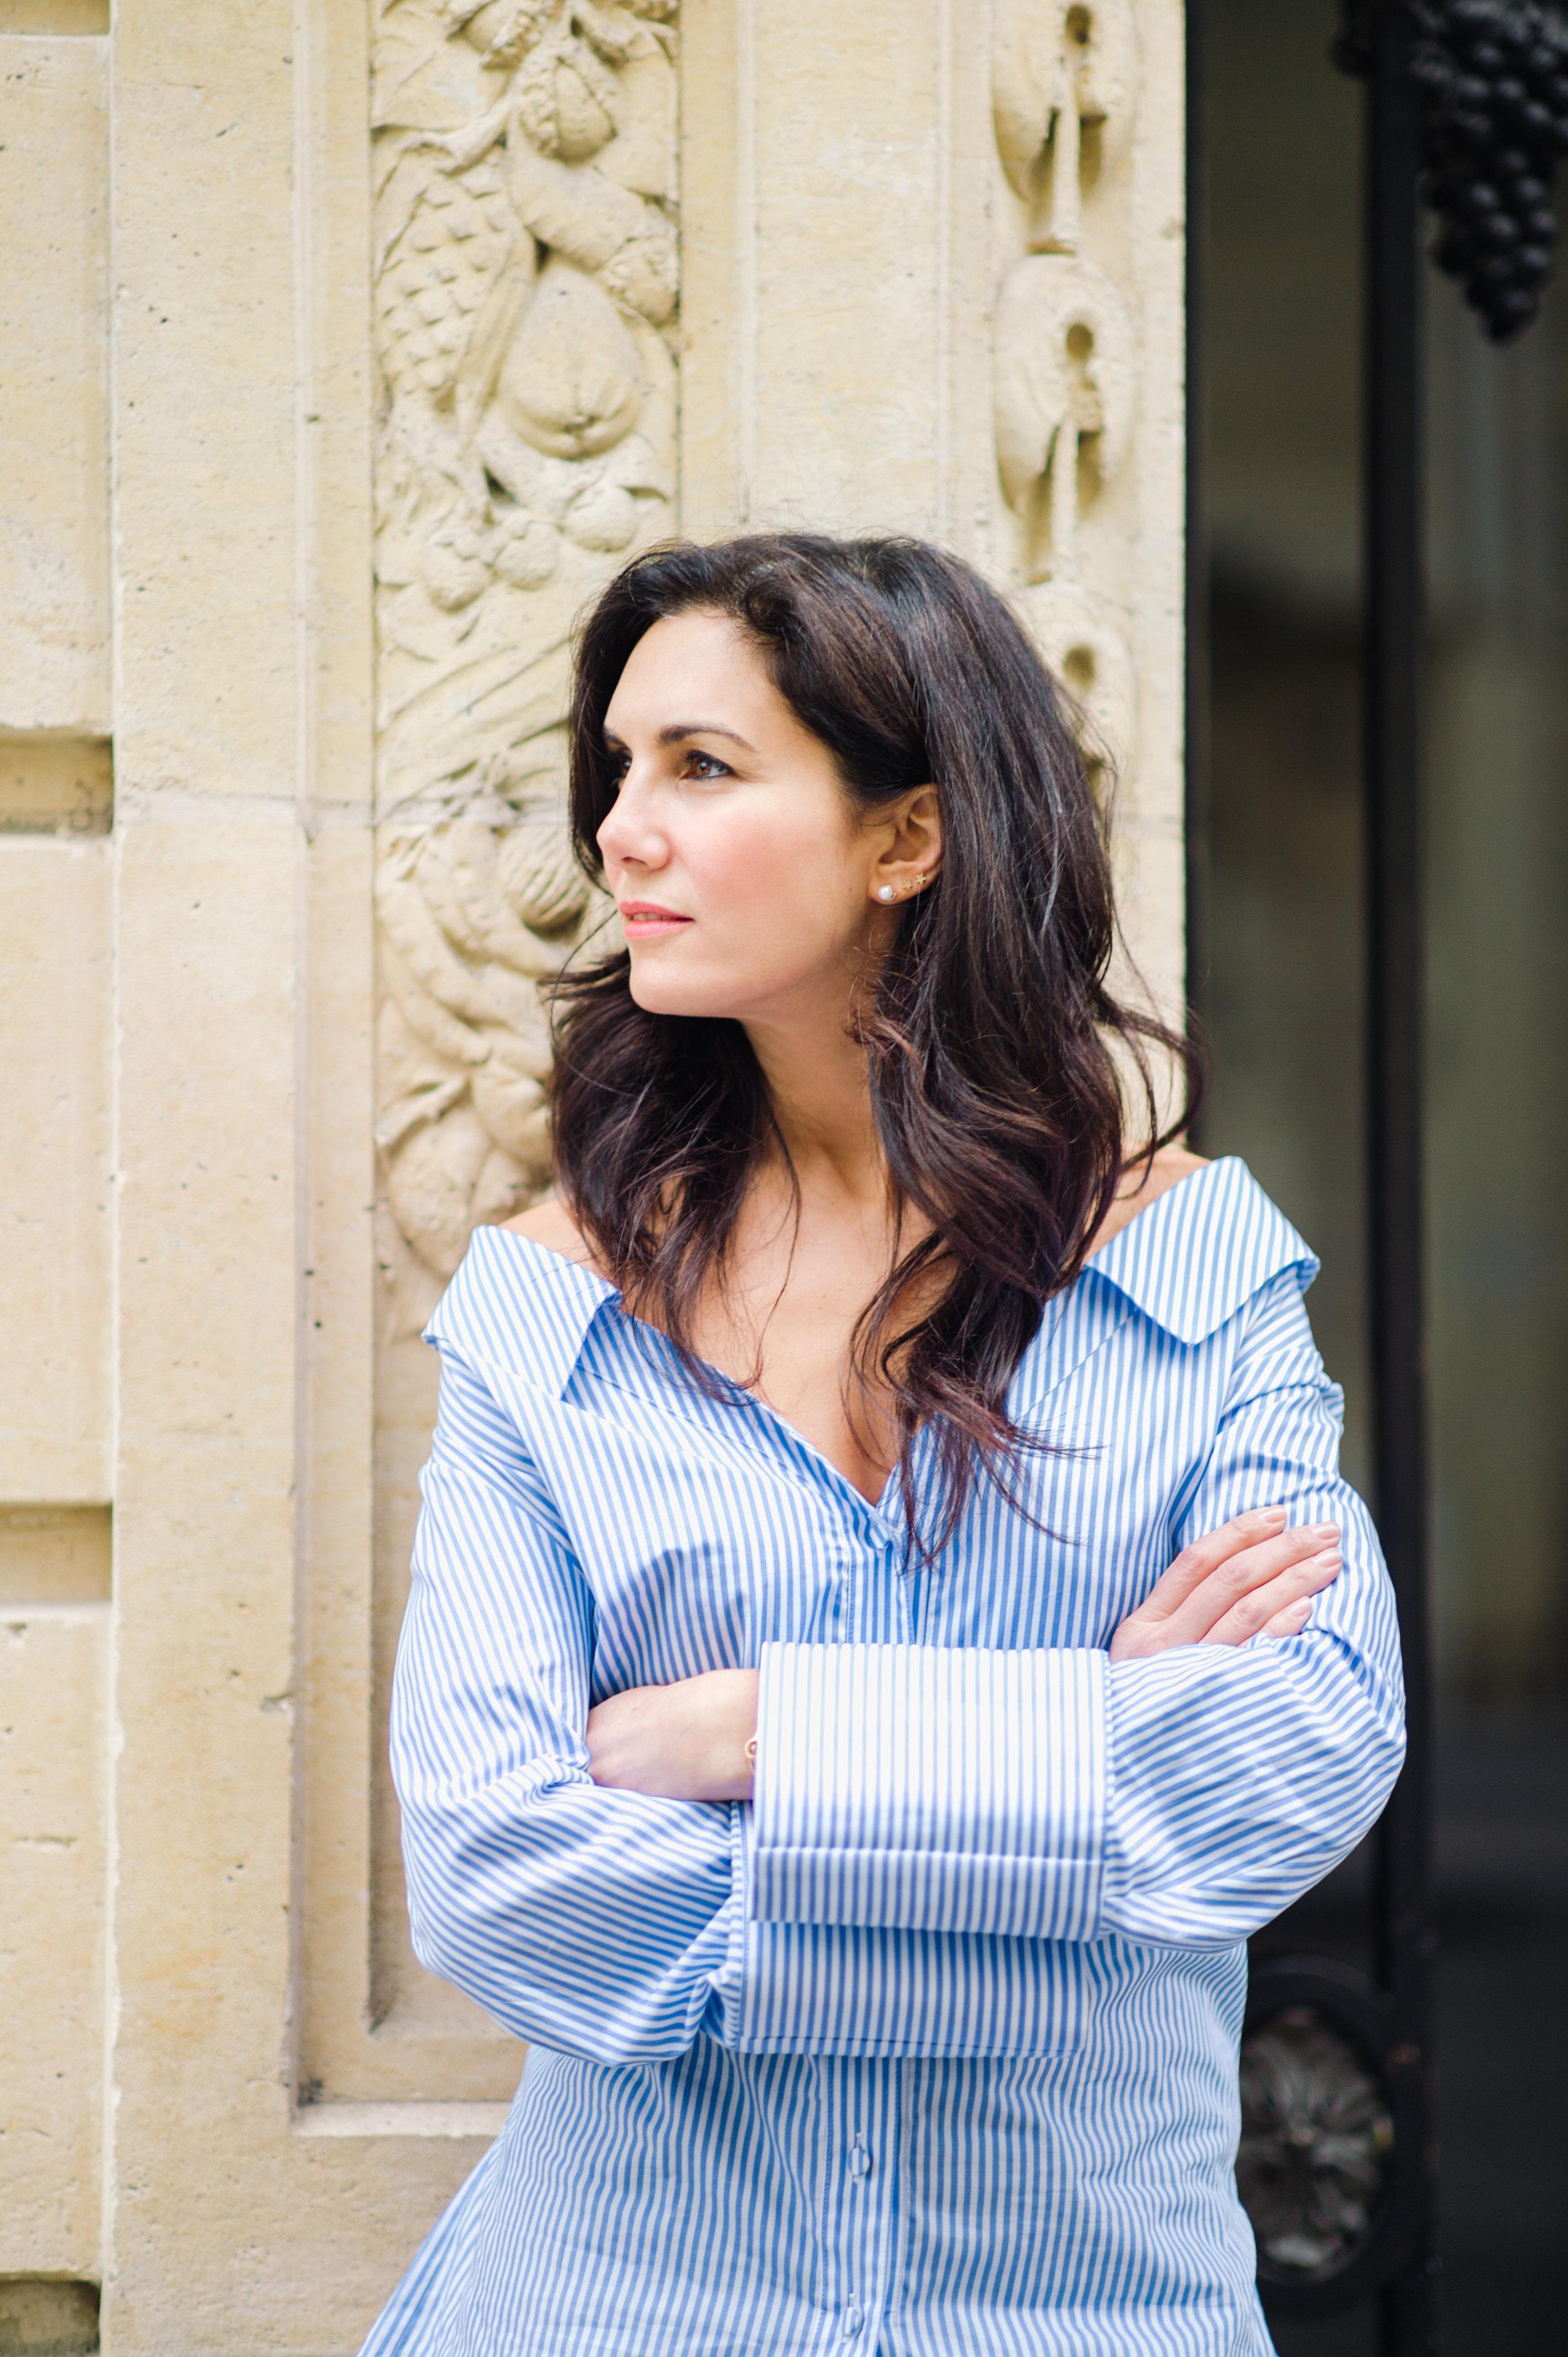 Elisabeth-Jones-Hennessy-Blue-Shirting-Menswear-Shopping-Paris-02